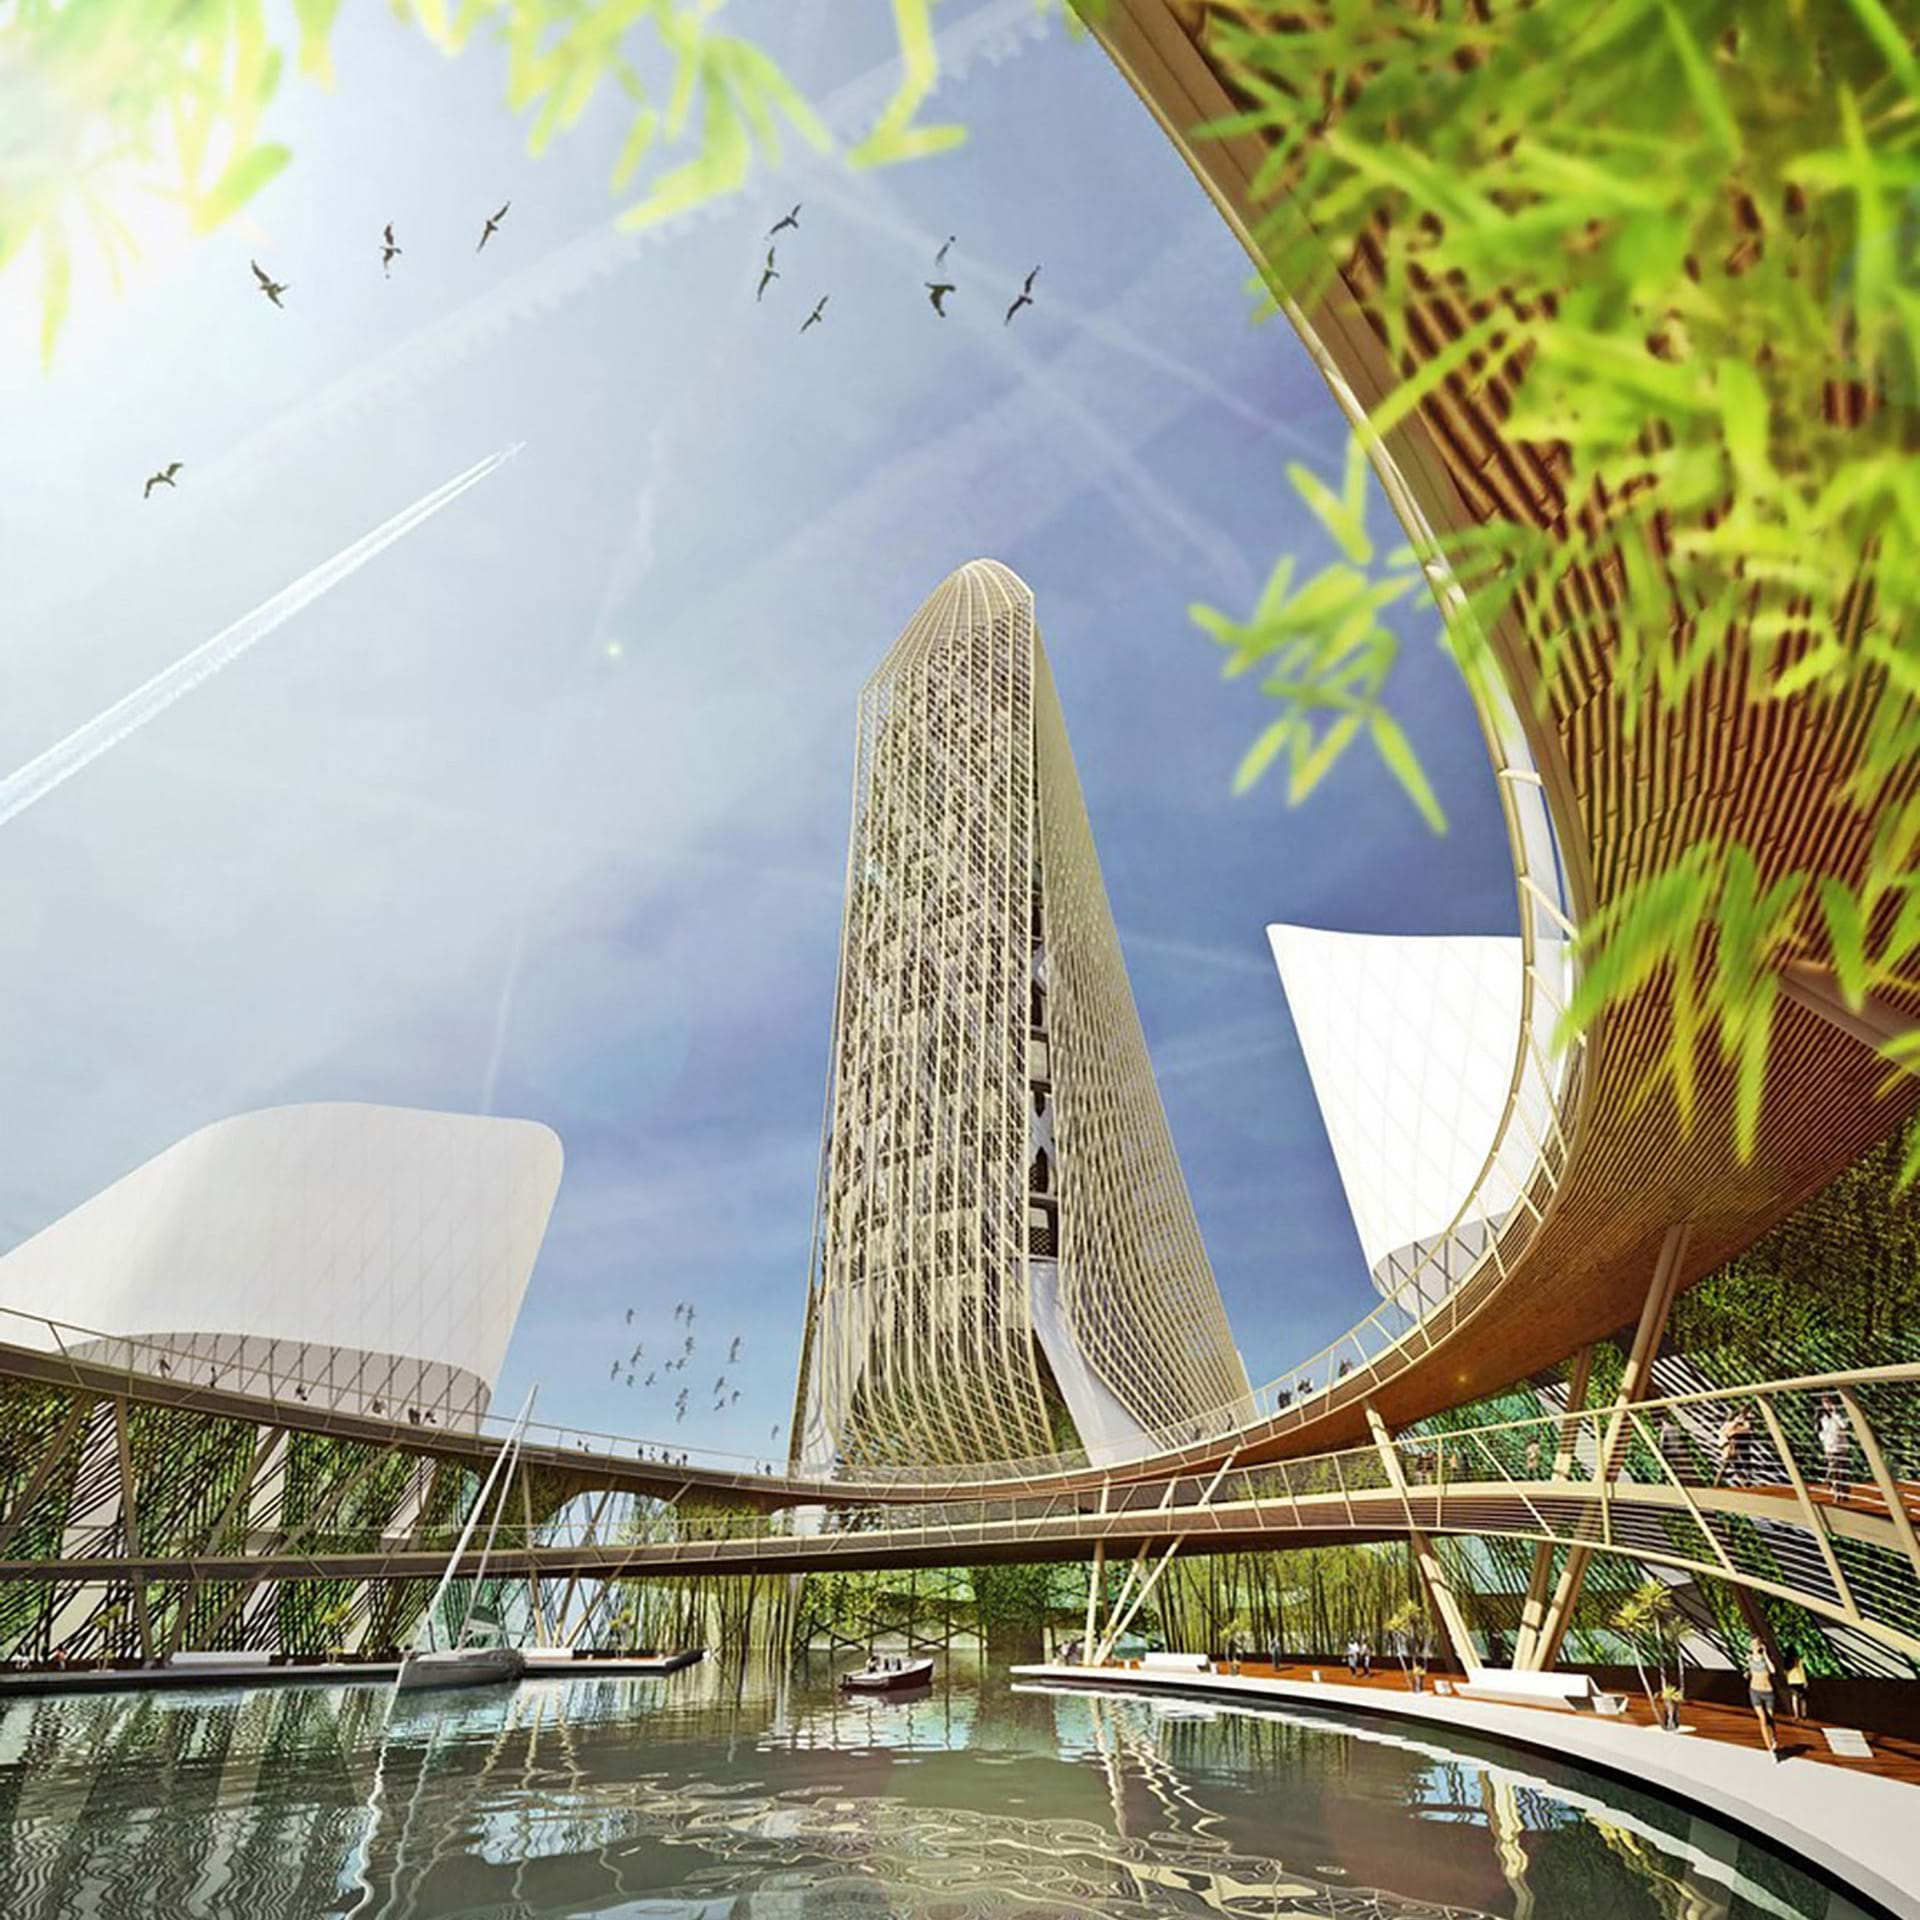 sss-bamboo-skyscraper-s180314-sr4__Web_1920_c100.jpg